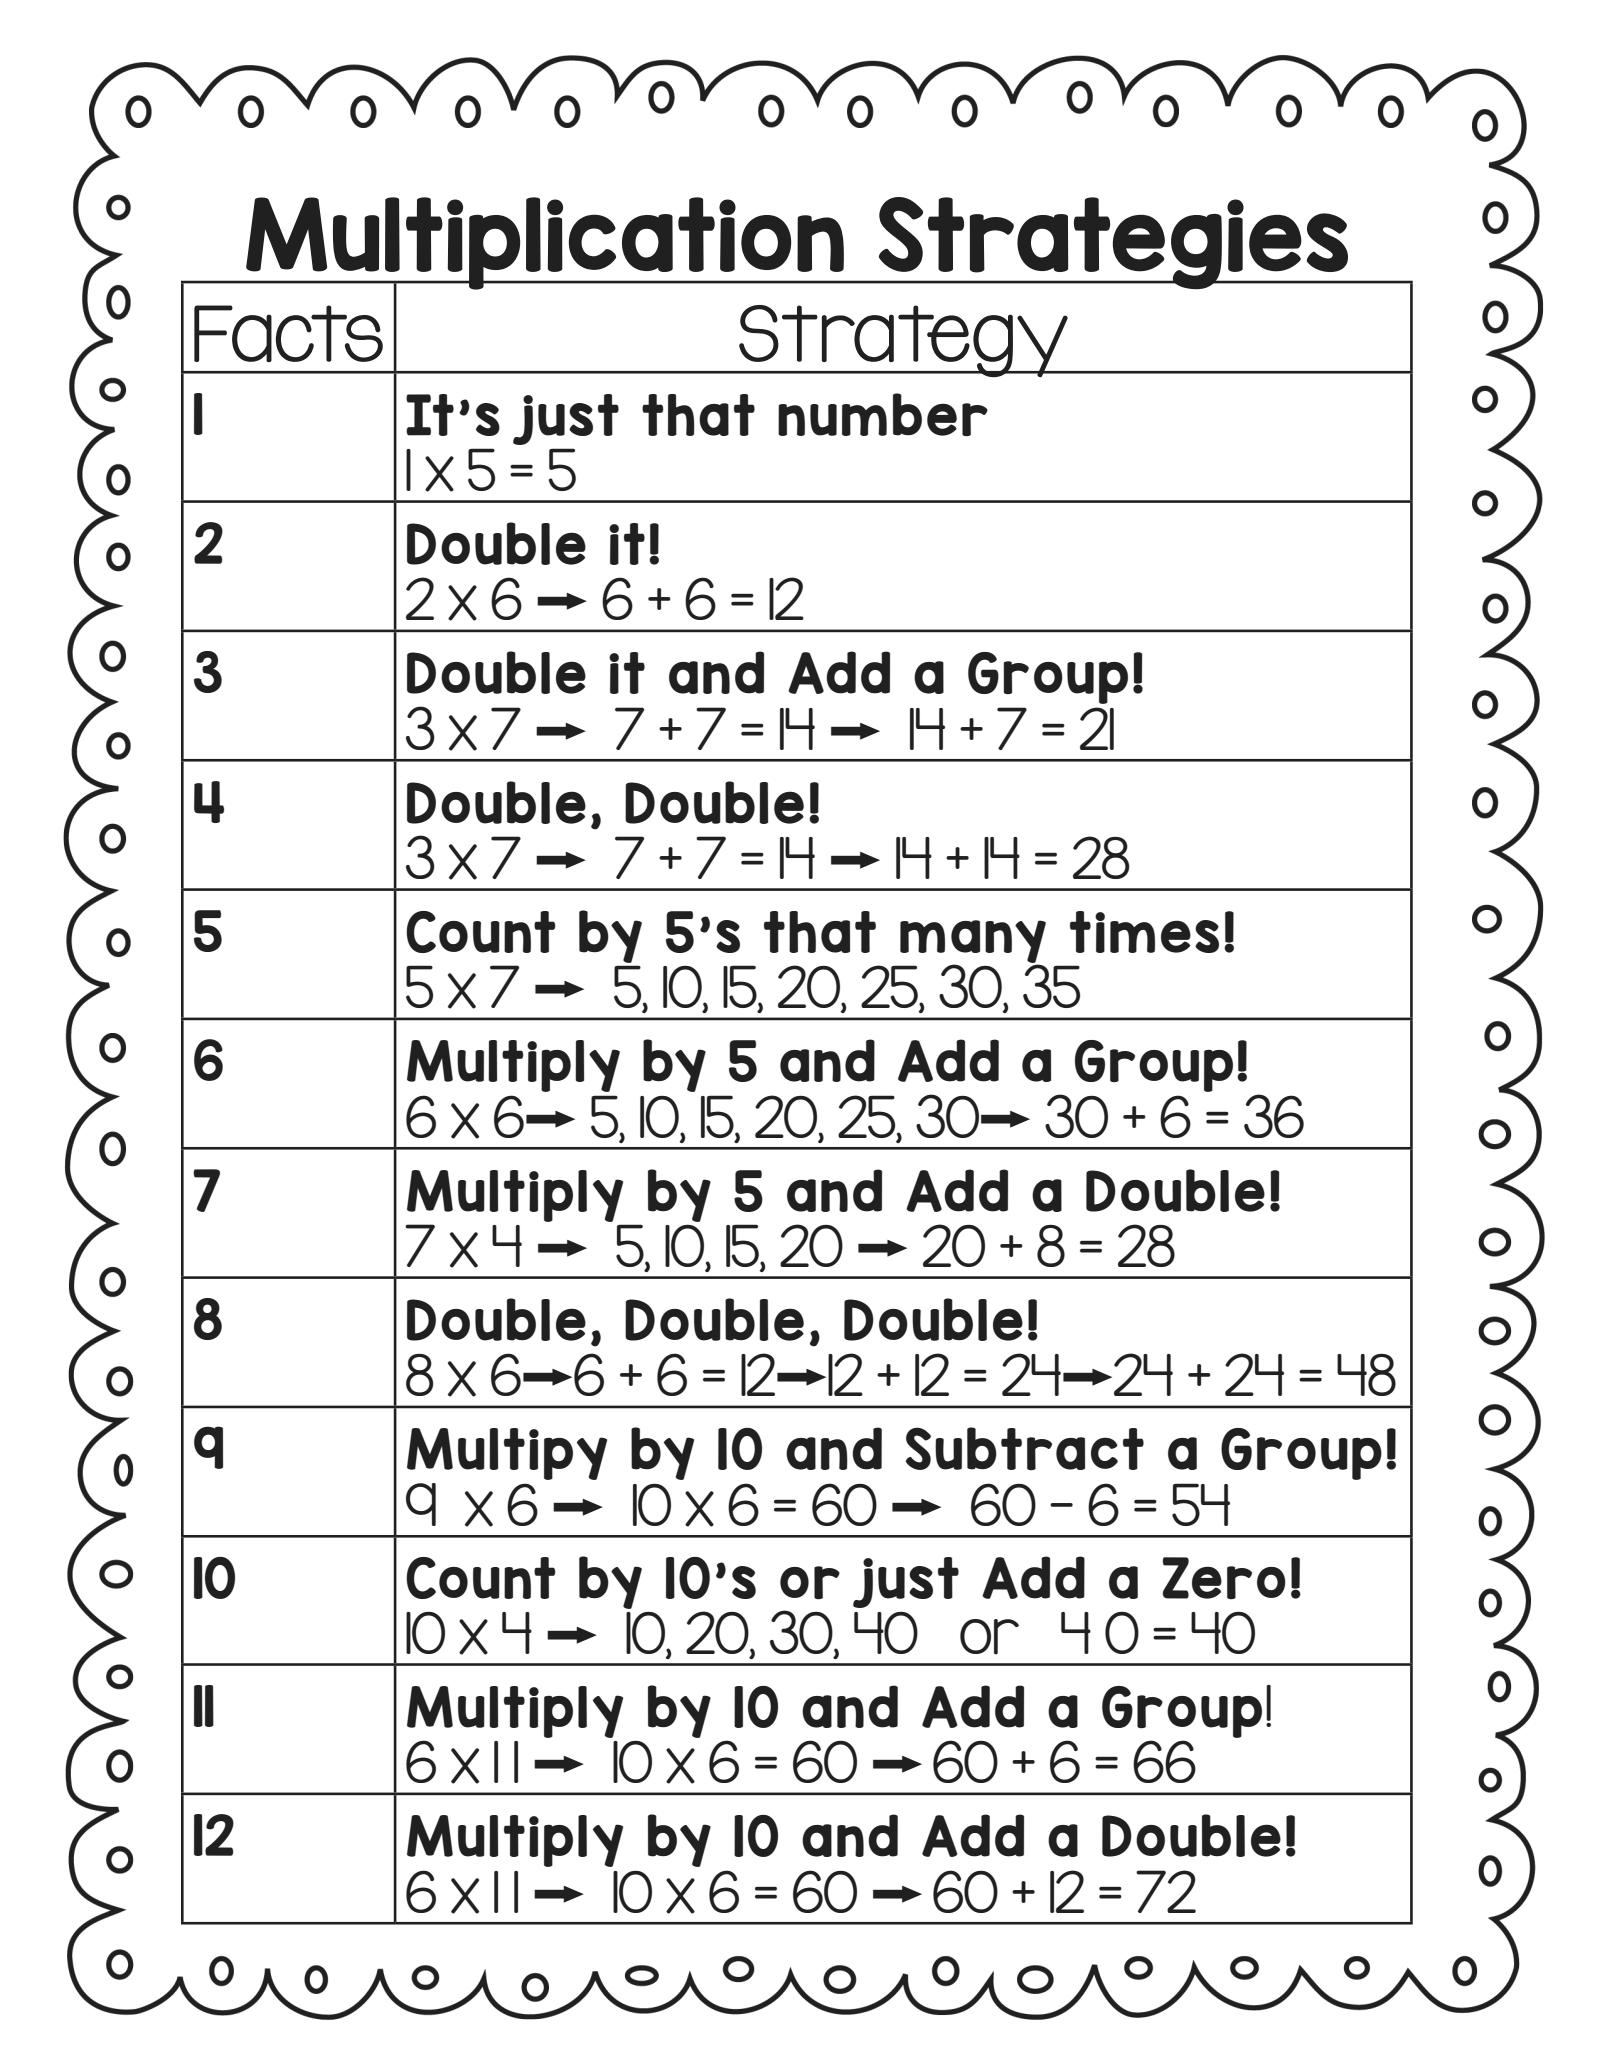 Fresh Ideas - Page 2 of 2 Education math, Multiplication, Homeschool math